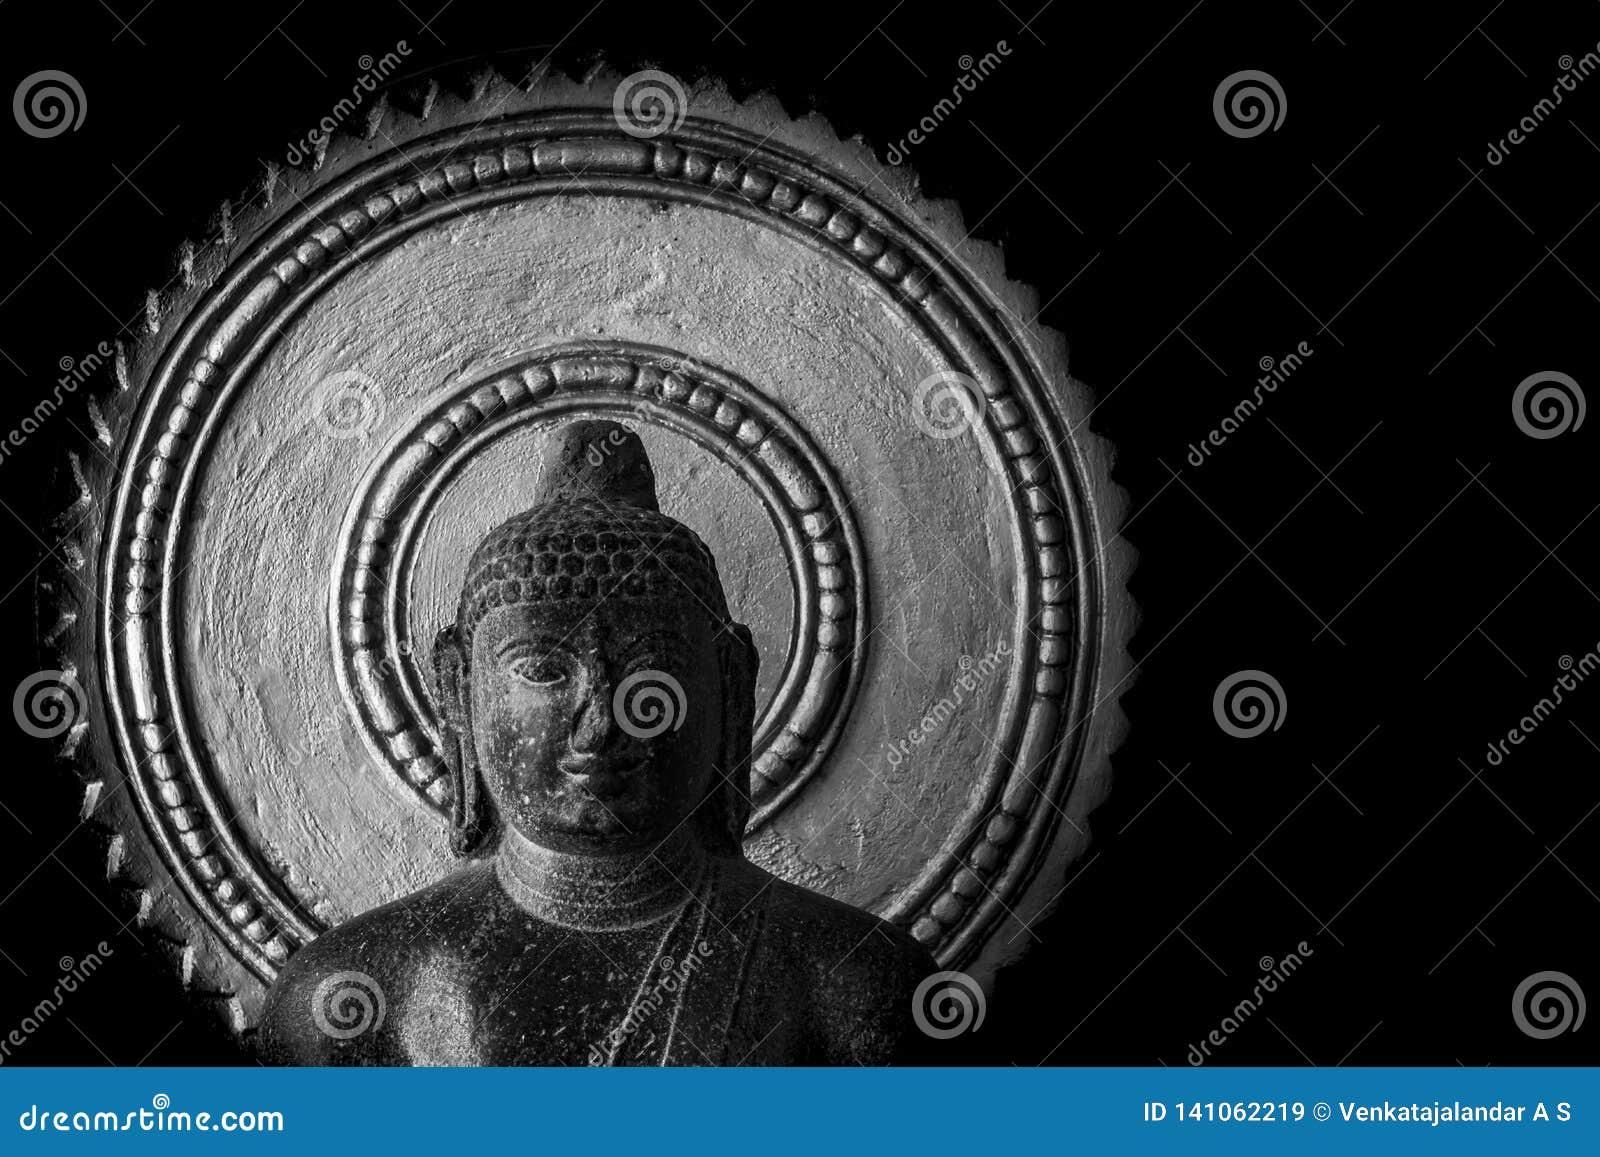 Vecchia statua di Buddha scolpita in pietra - museo di Thanjavur